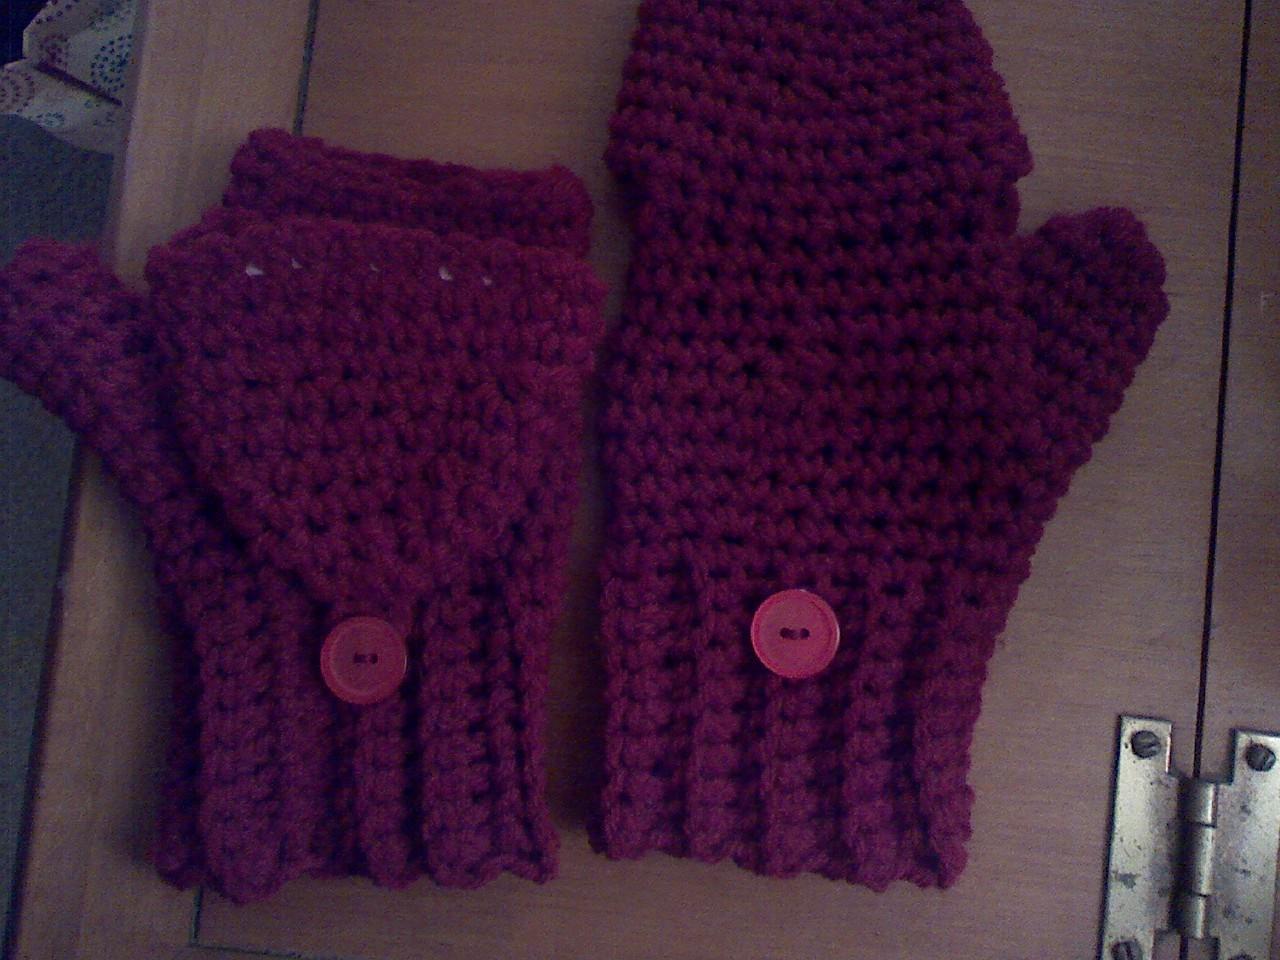 Free Crochet Patterns Flip Top Mittens : The Nutritarian Family: Fingerless Gloves, Mittens, Flip ...